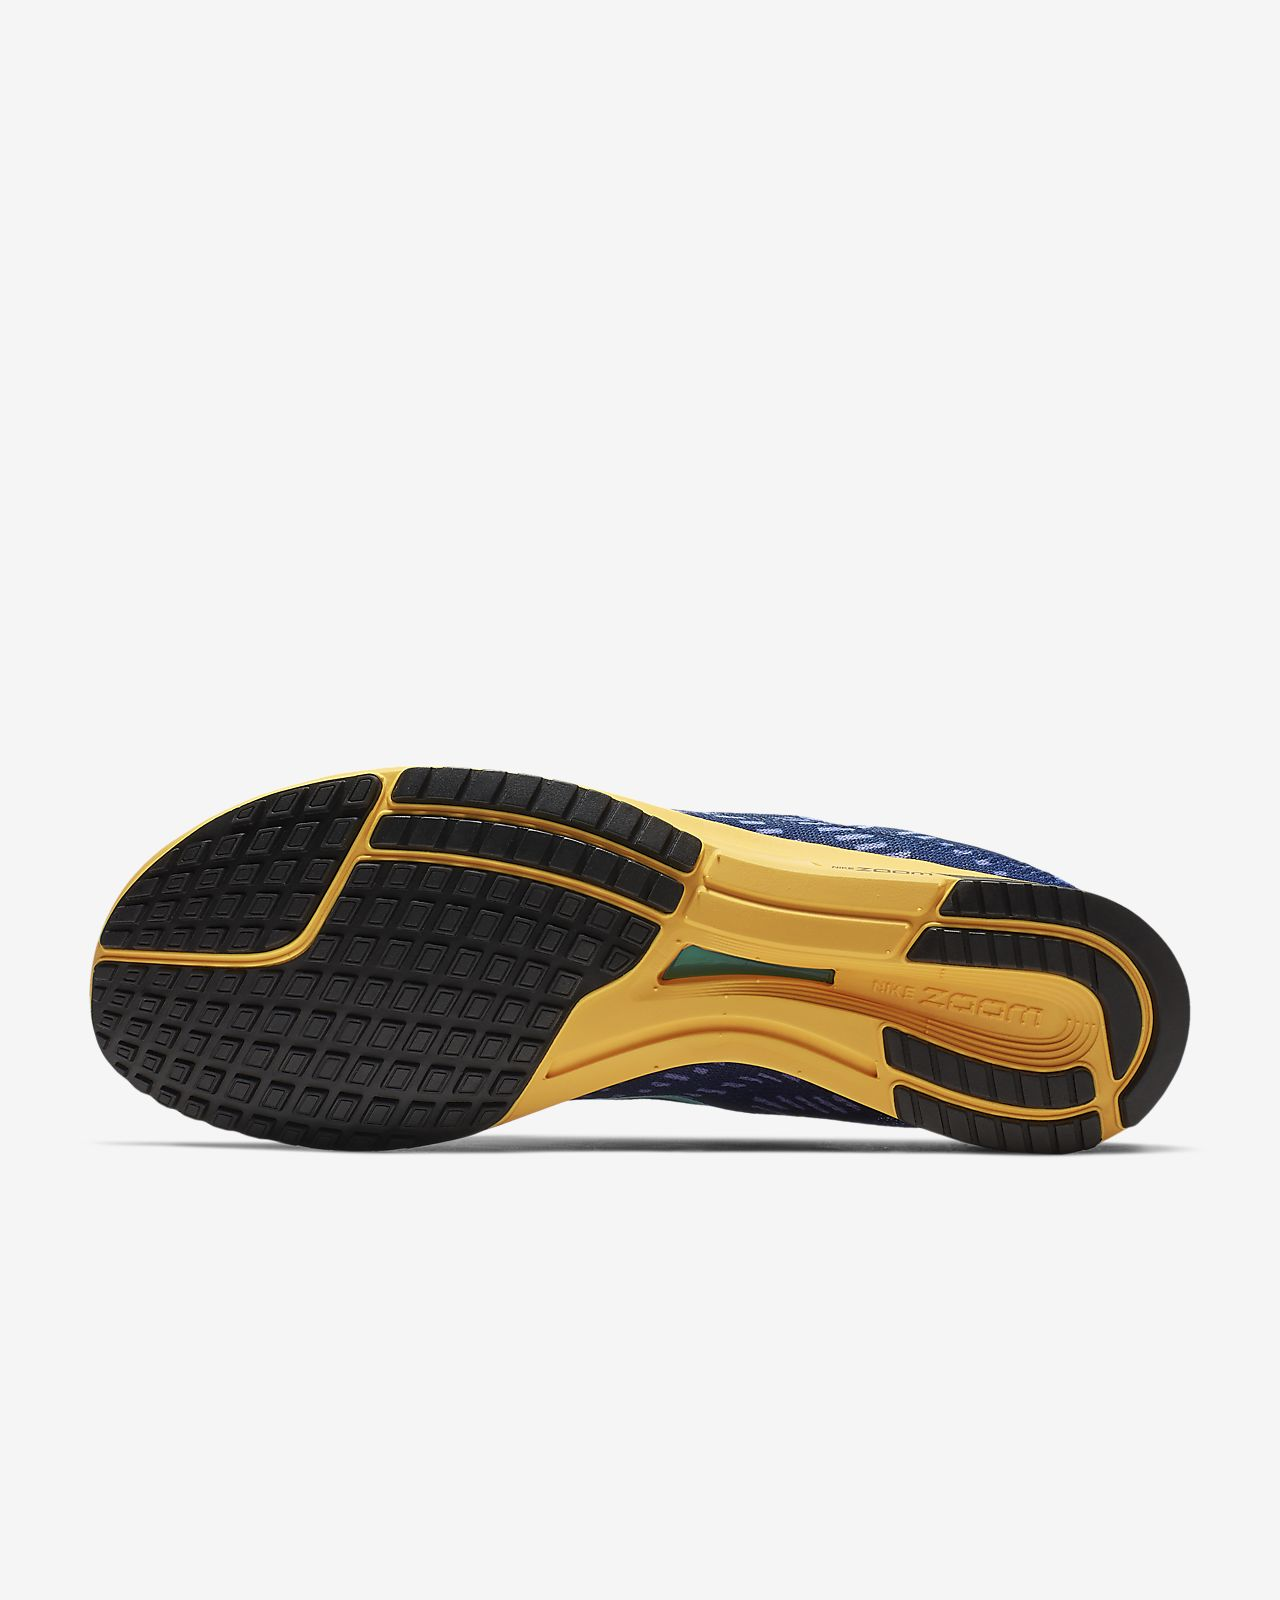 a967c32ca332 Nike Air Zoom Streak LT 4 Racing Shoe. Nike.com